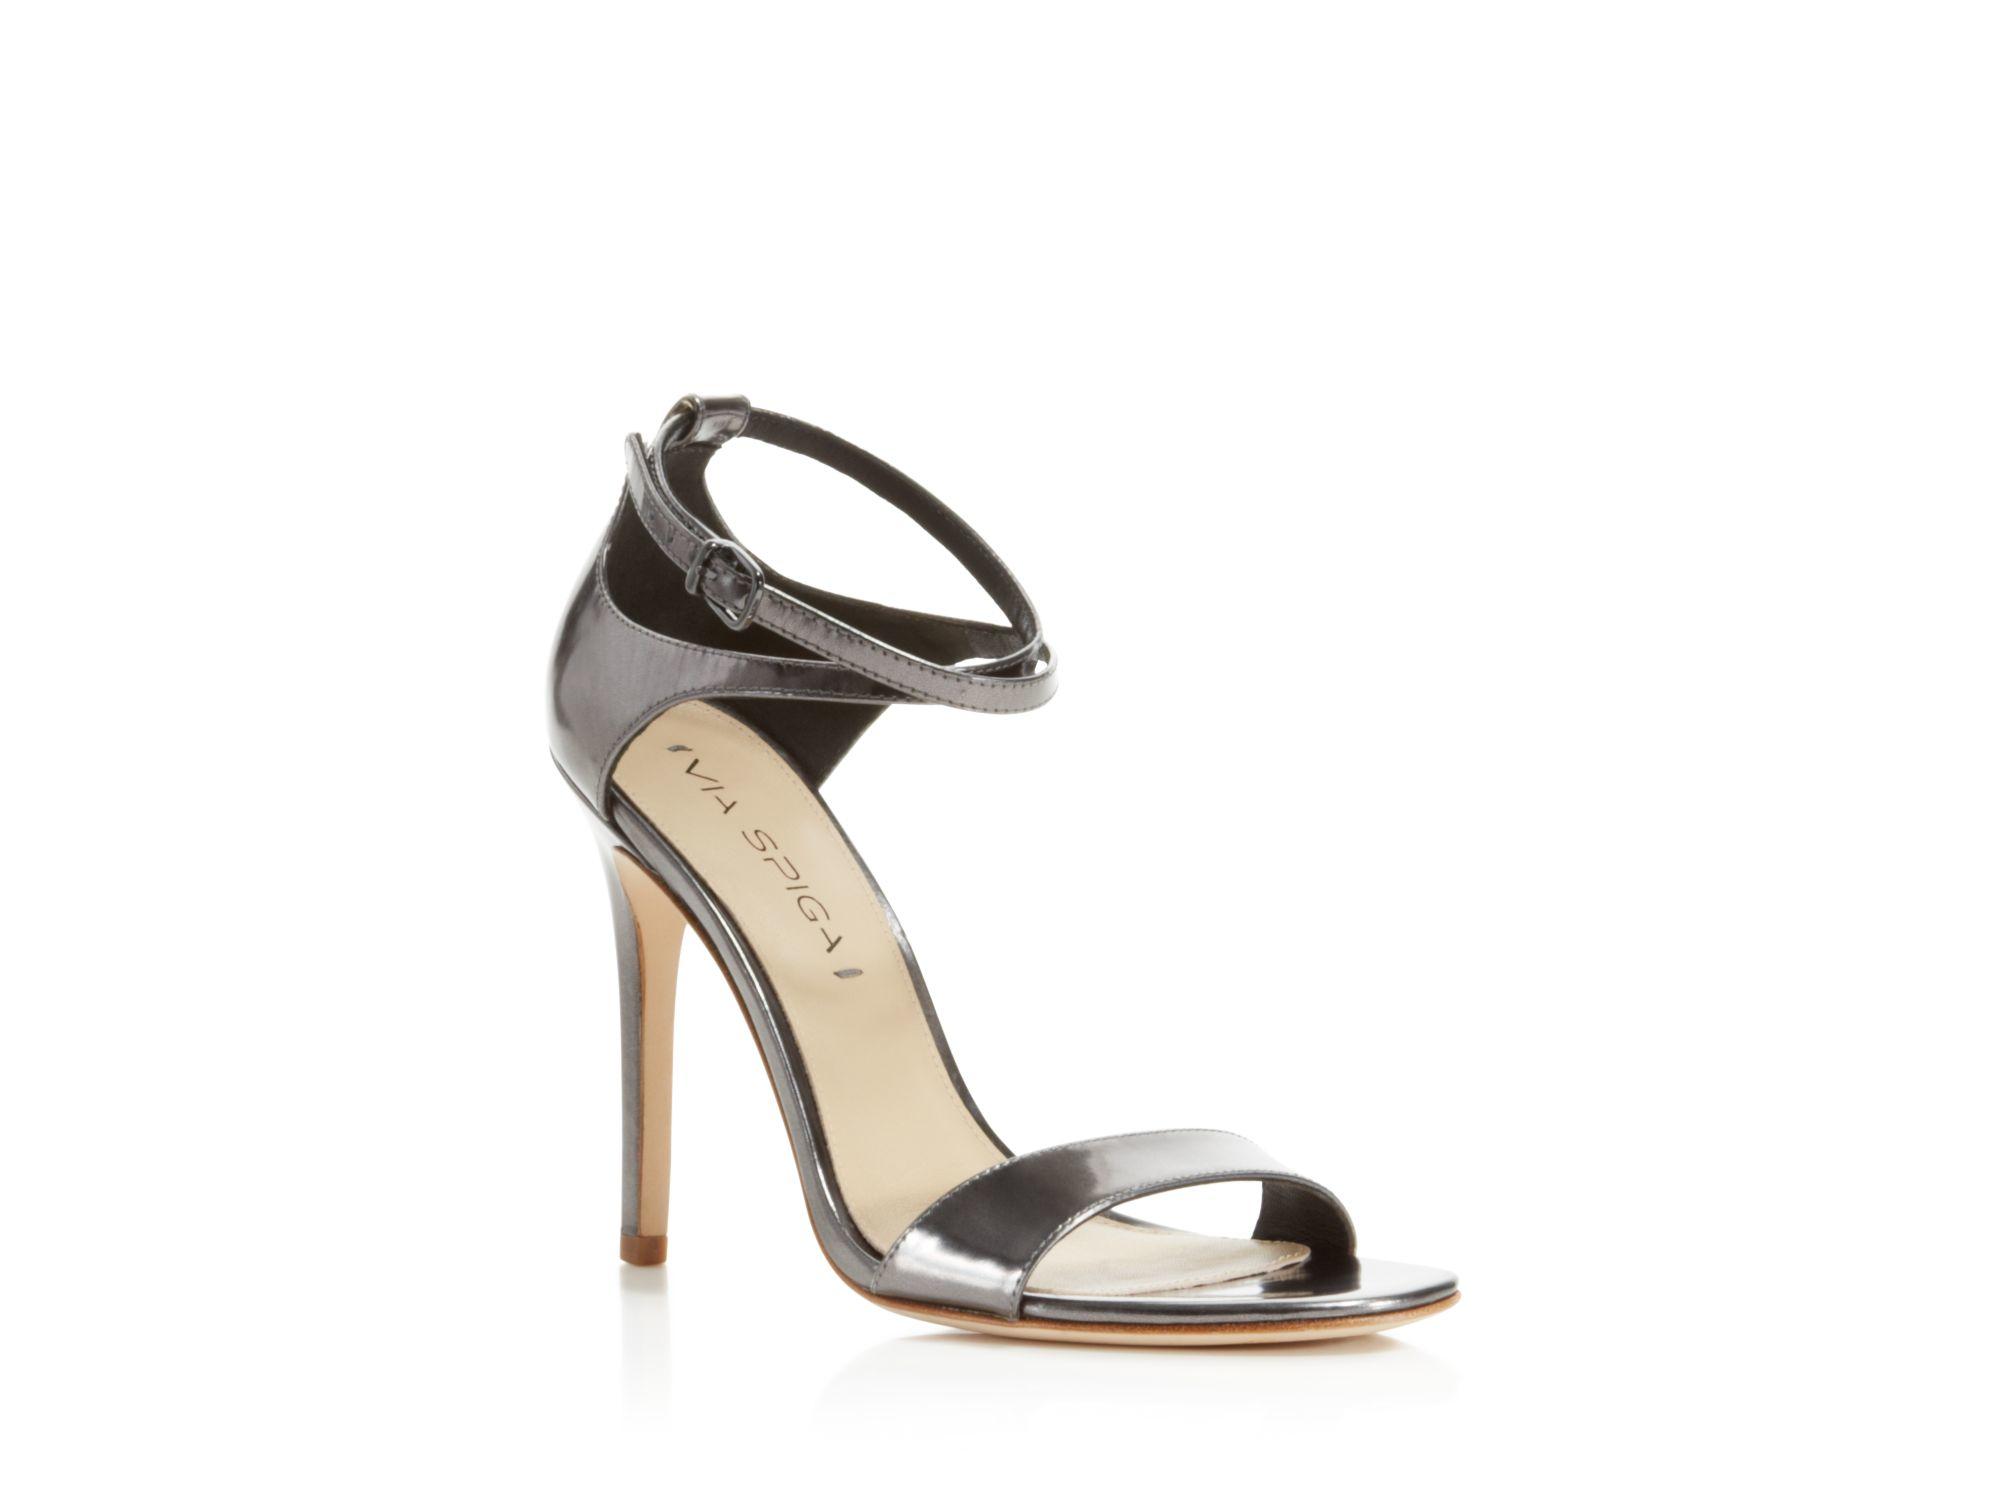 5efc6f196a6 Via Spiga Tiara Metallic Ankle Strap High Heel Sandals in Metallic ...